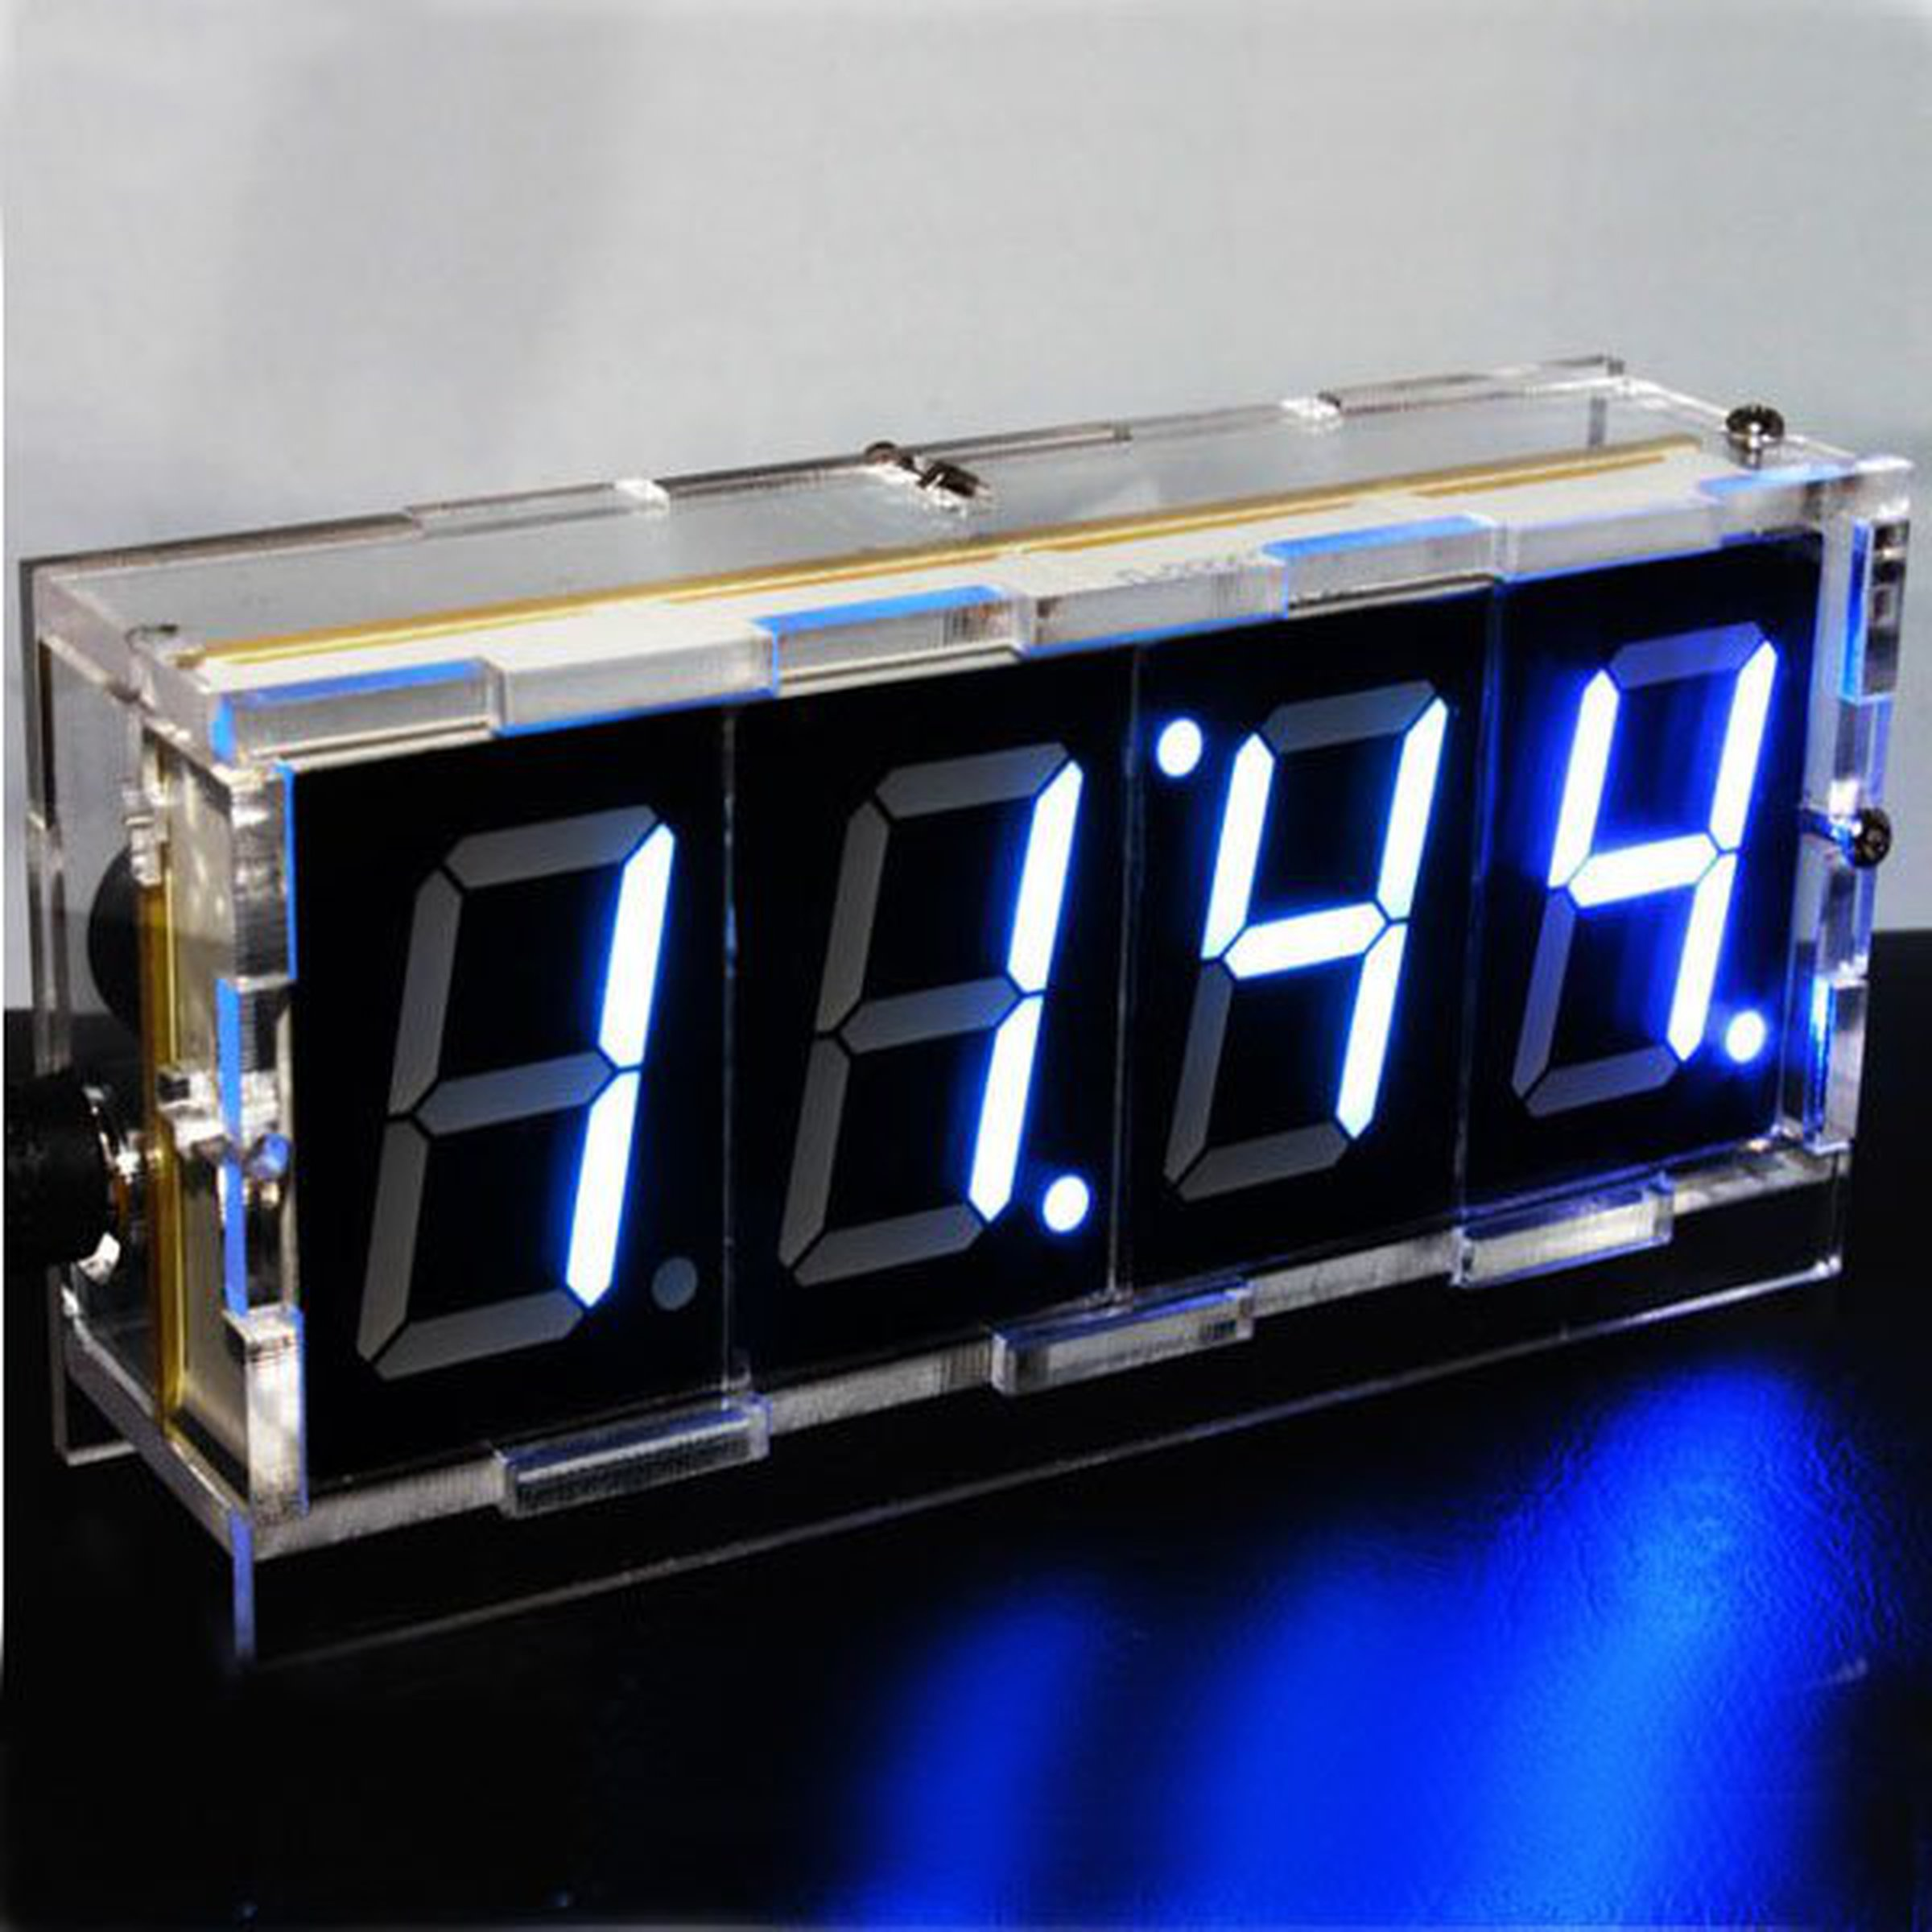 Kits On Tindie Electronic 2014 New Fm Radio Walkie Talkies Circuit Board Sale Diy 4 Digit Led Clock Kit Large Screen